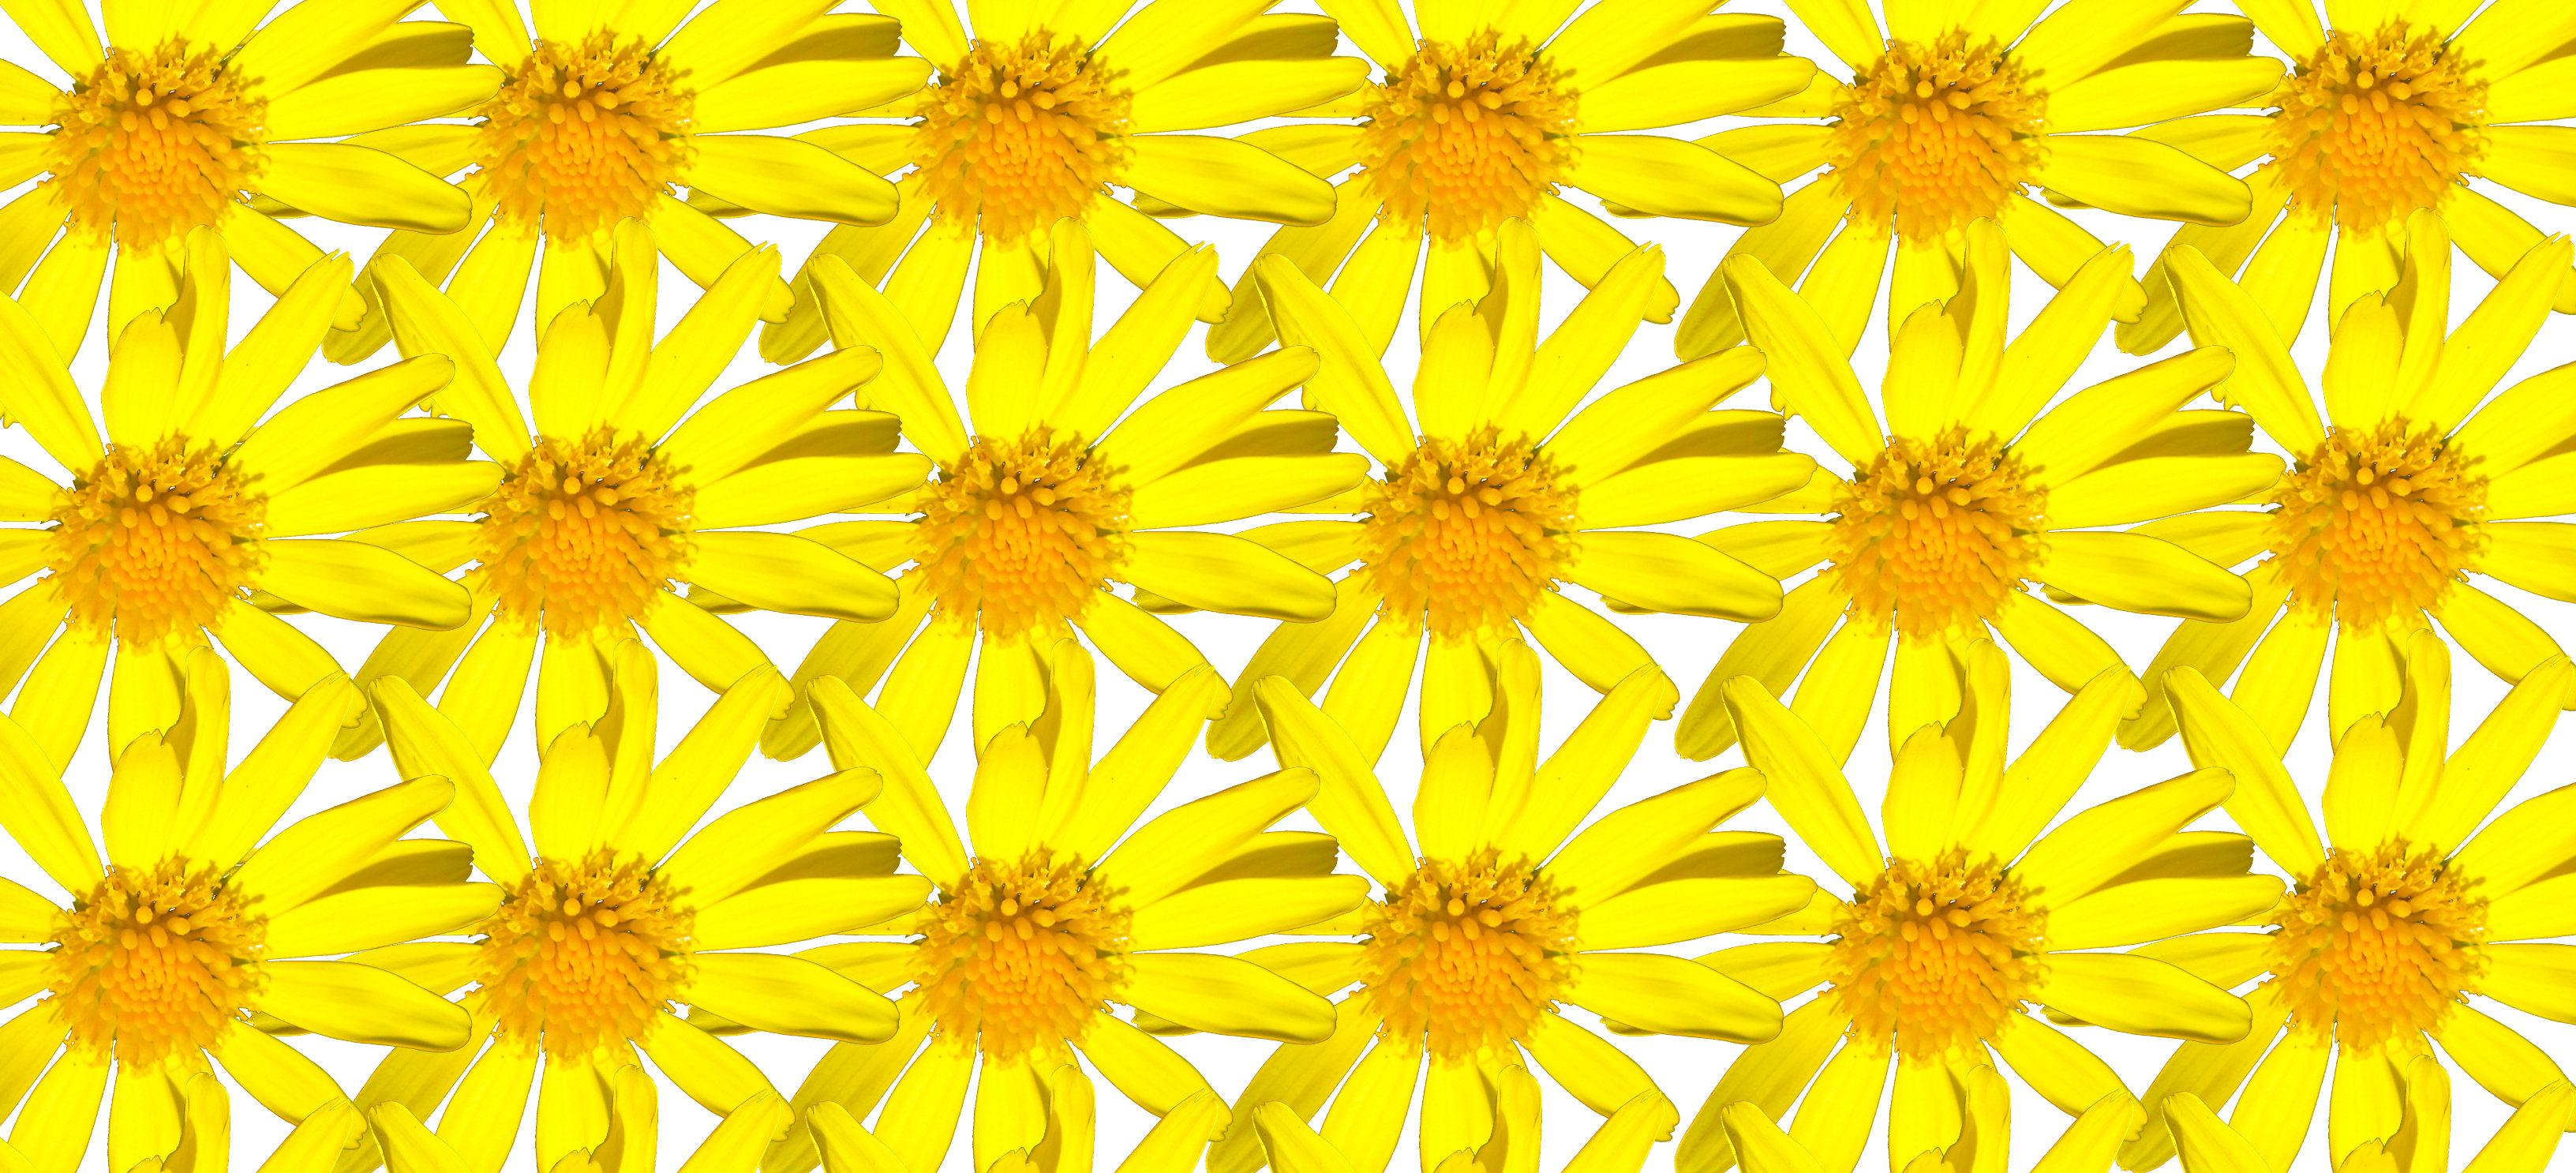 repeating daisies